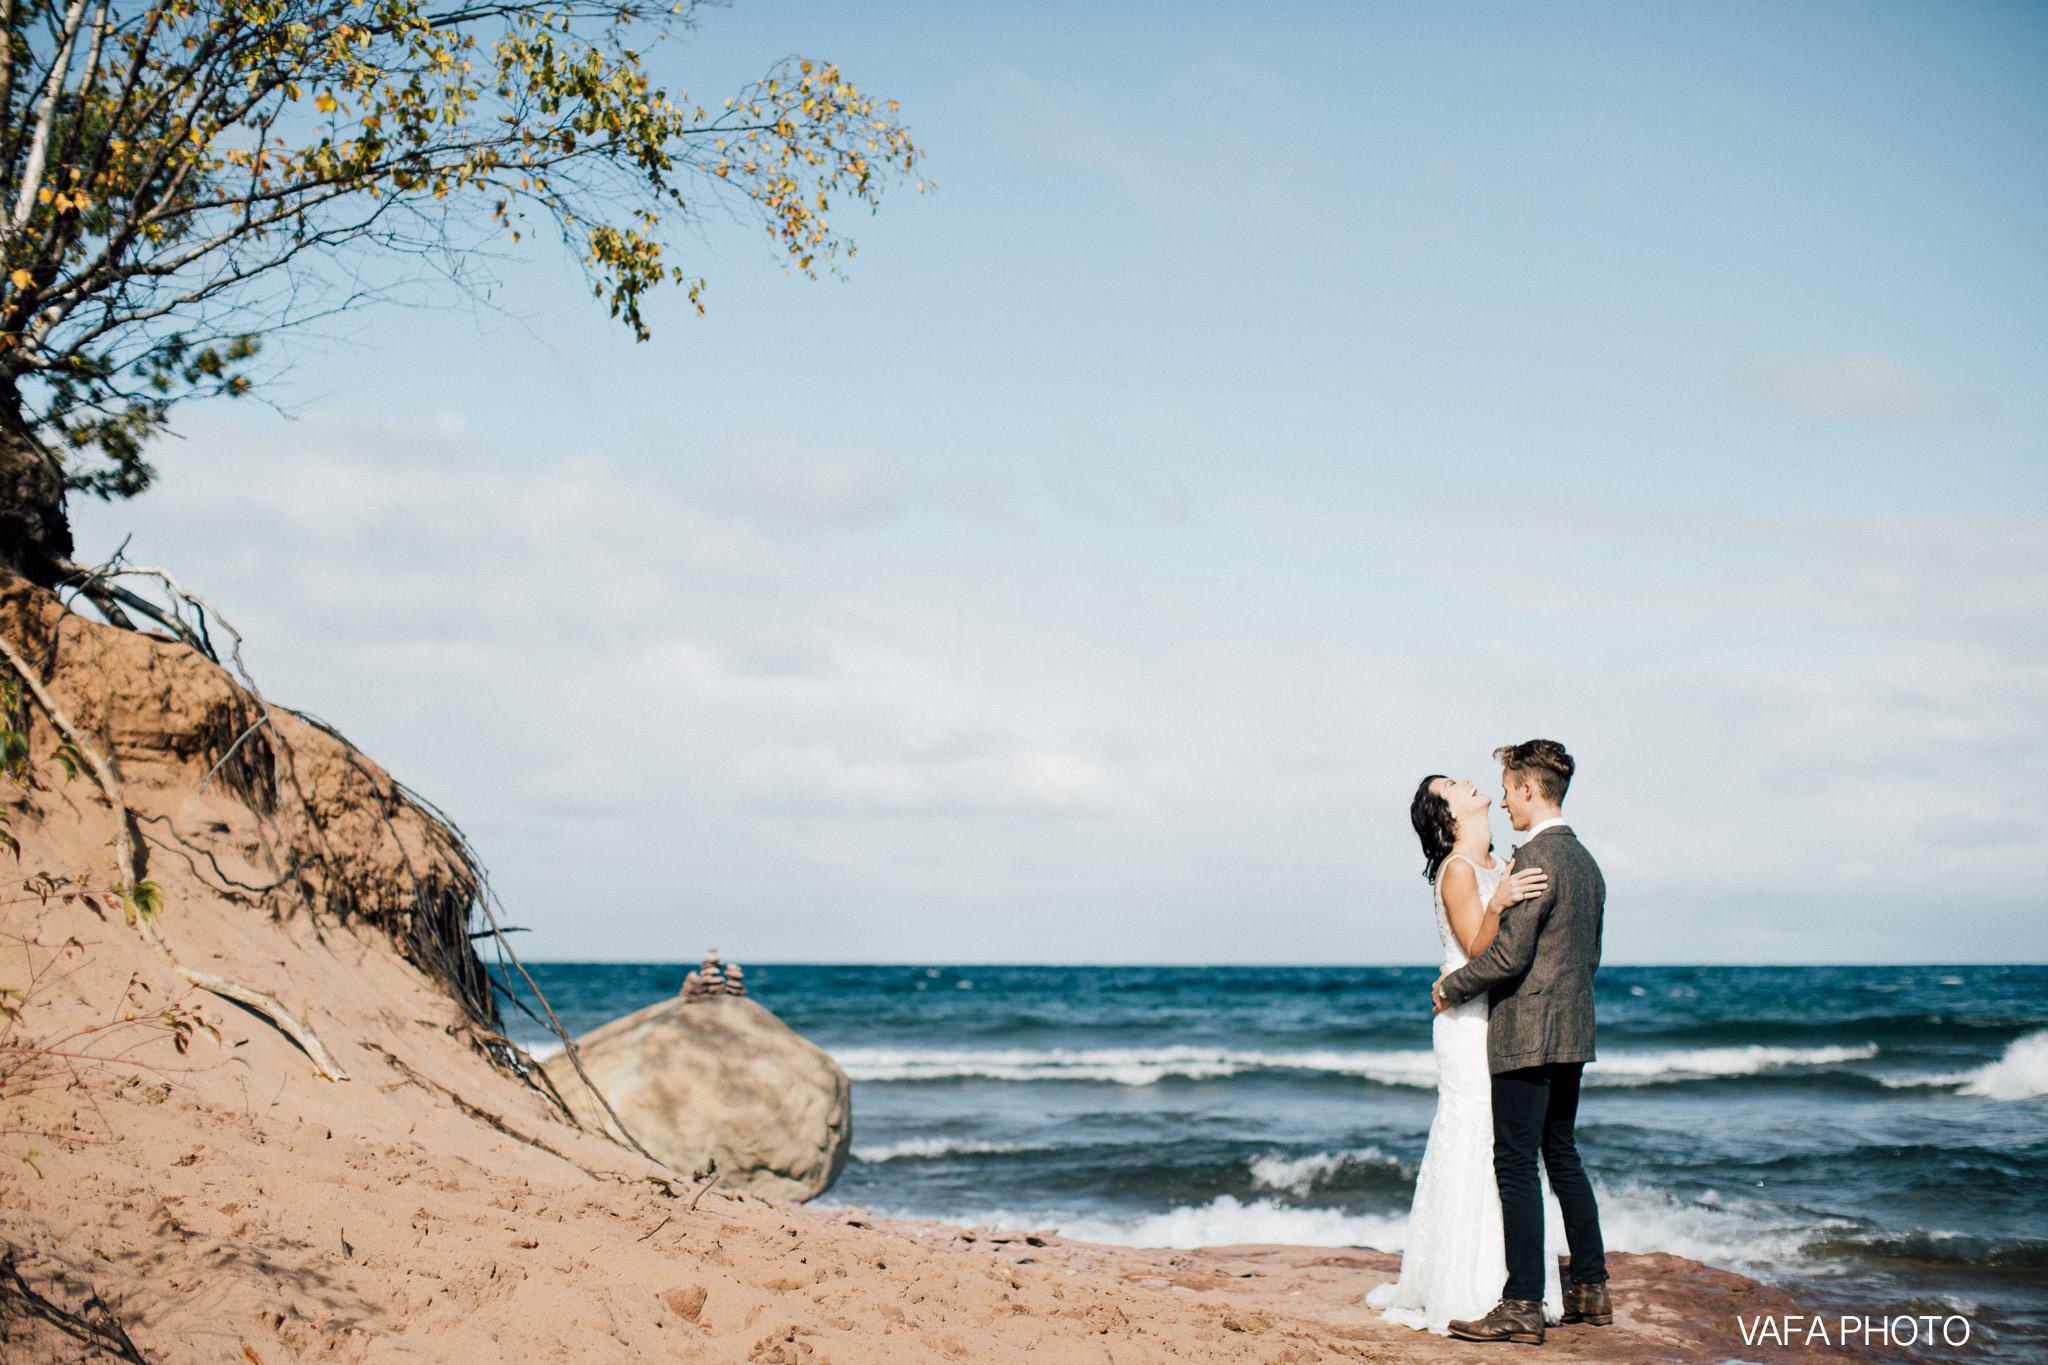 Hogback-Mountain-Wedding-Chelsea-Josh-Vafa-Photo-628.jpg